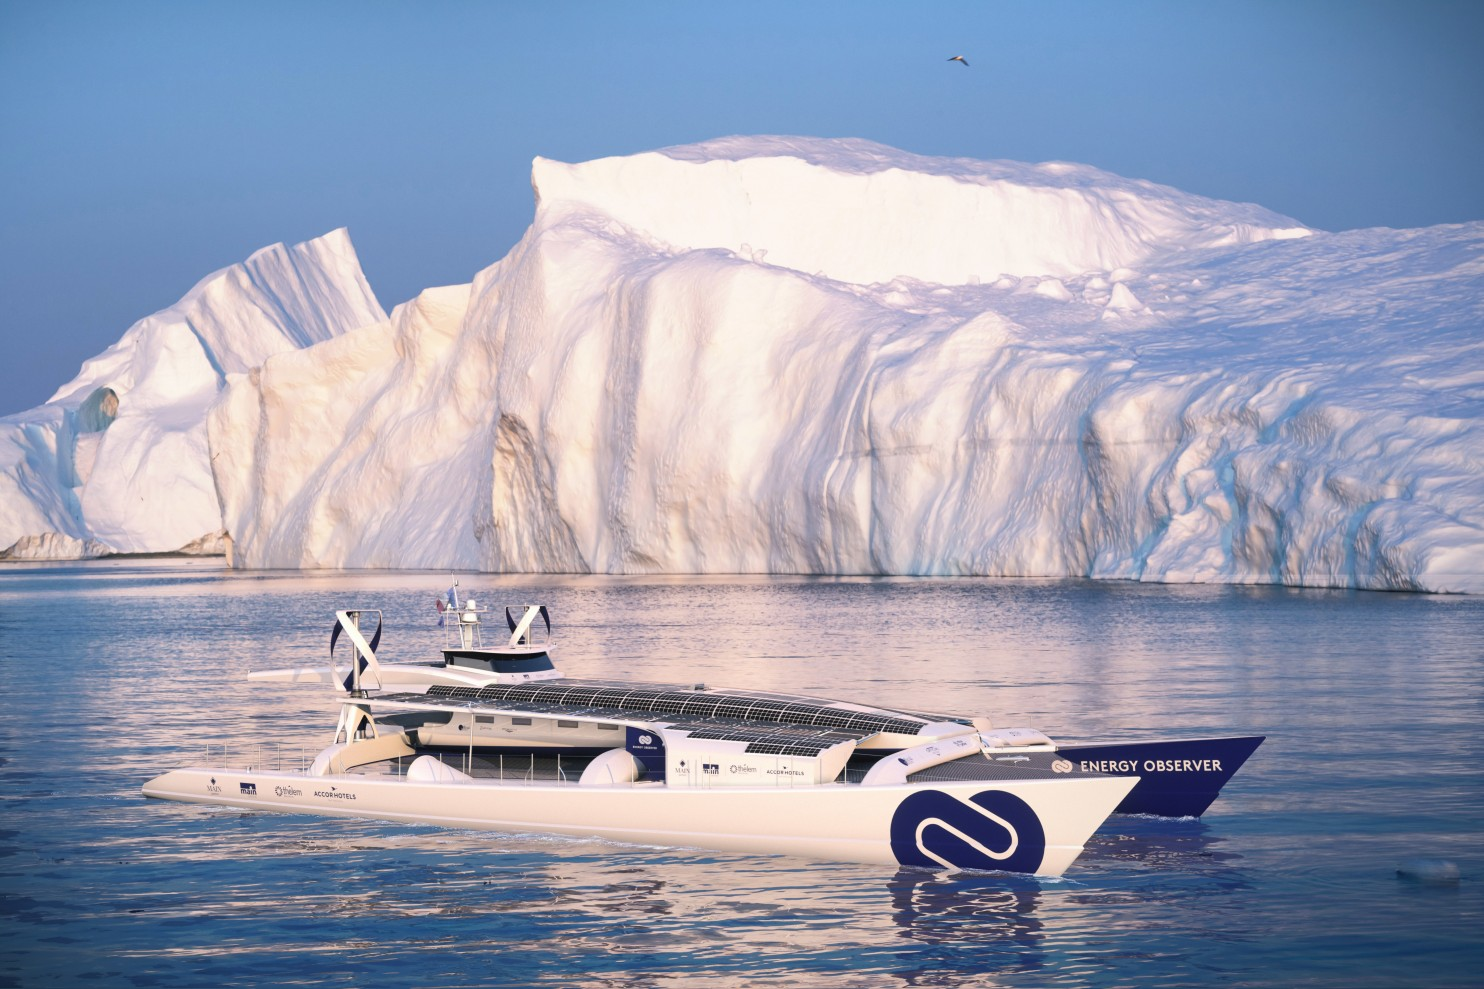 Energy Observer - Innovative hybrid solar/wind self-generating hydrogen-powered vessel currently circumnavigating